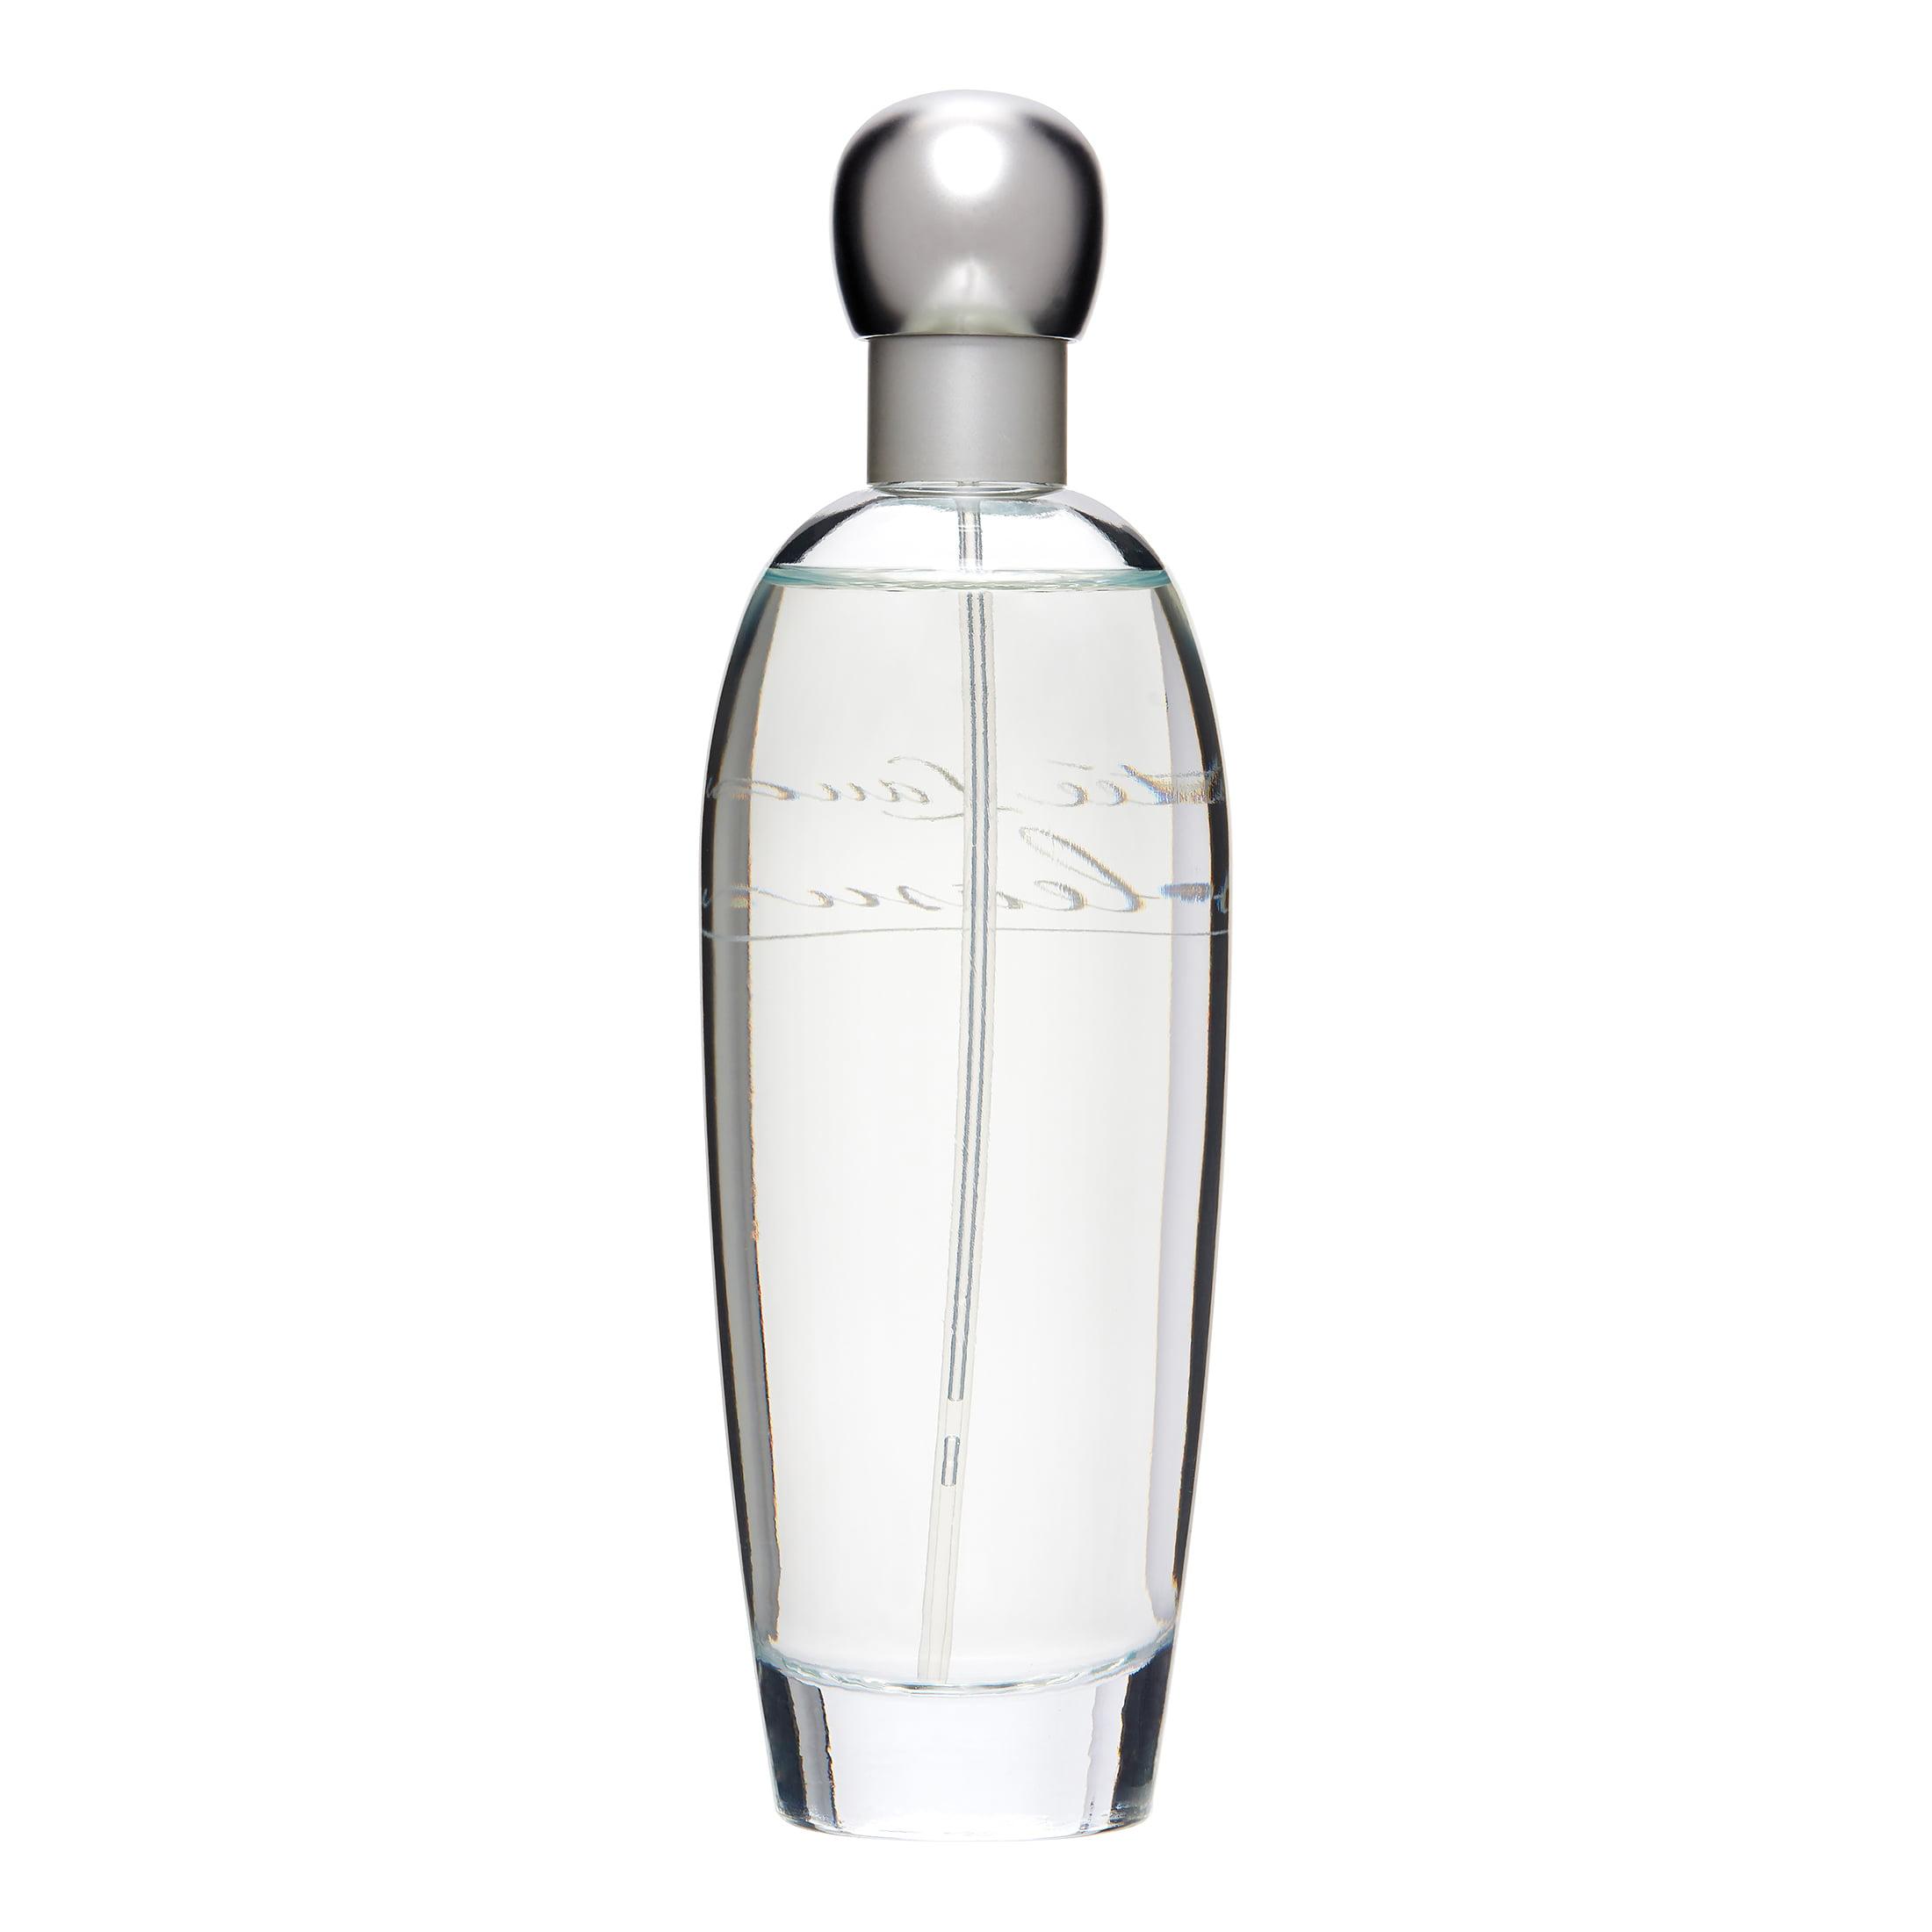 Estee Lauder Pleasures Eau De Parfum Spray Perfume Women Christmas Intense For Edp 100ml Gift 34 Oz